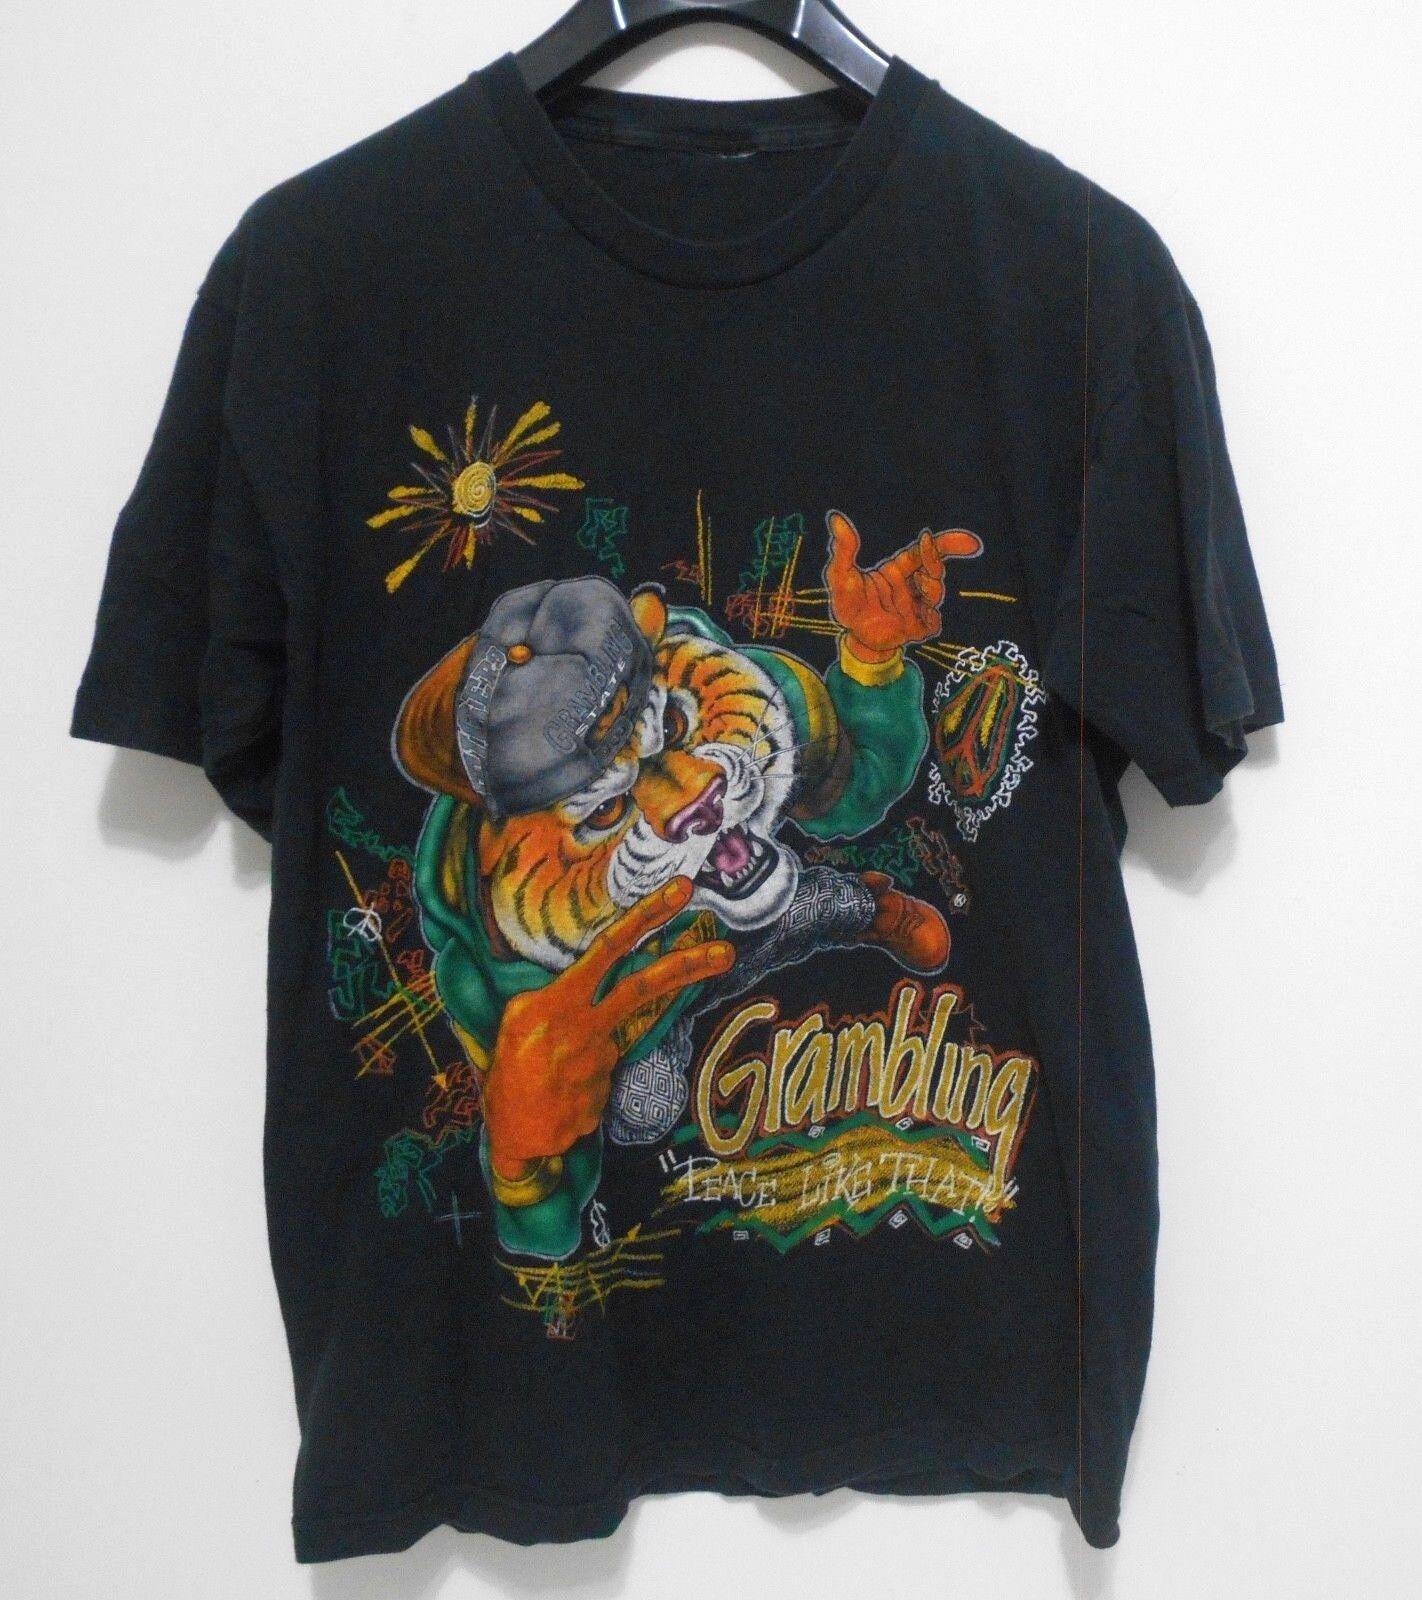 VINTAGE GRAMBLING STATE University T-shirt - Men's Size L - NCAA Hip Hop Tigers